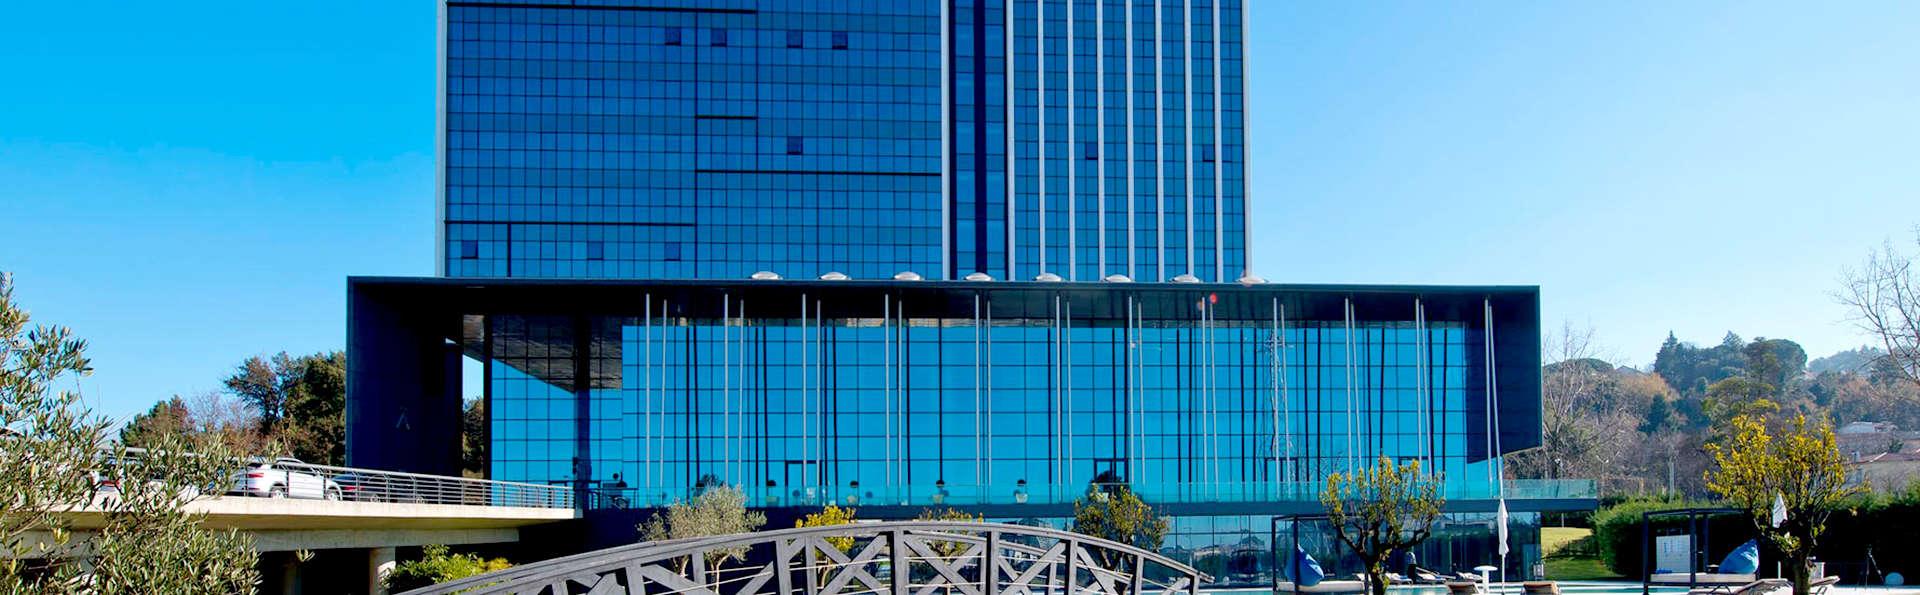 Meliá Braga Hotel & Spa  - Edit_Front.jpg